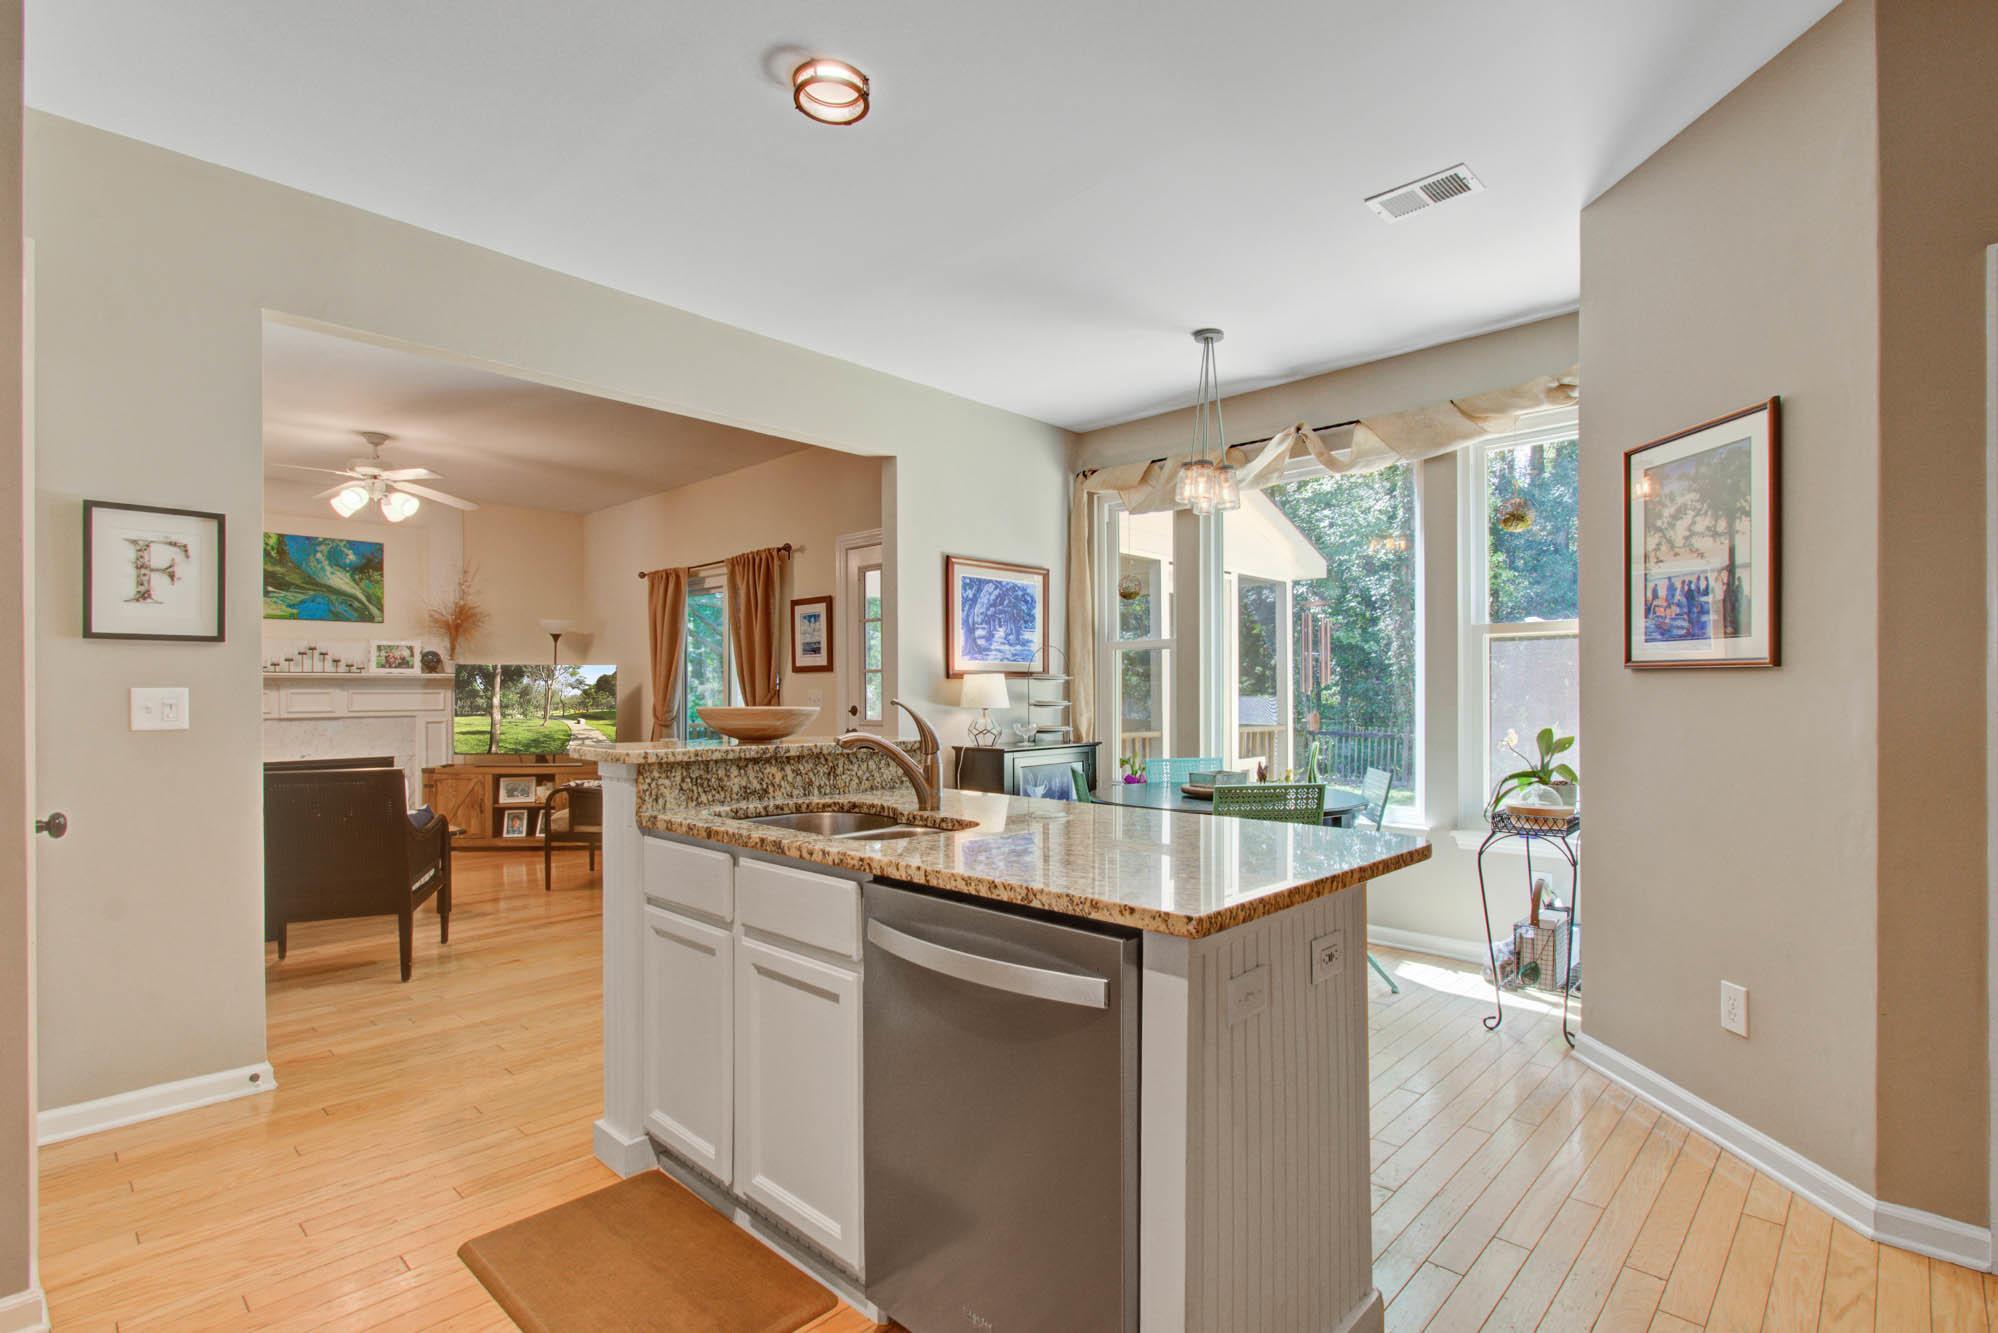 Brickyard Plantation Homes For Sale - 2753 Merwether, Mount Pleasant, SC - 16